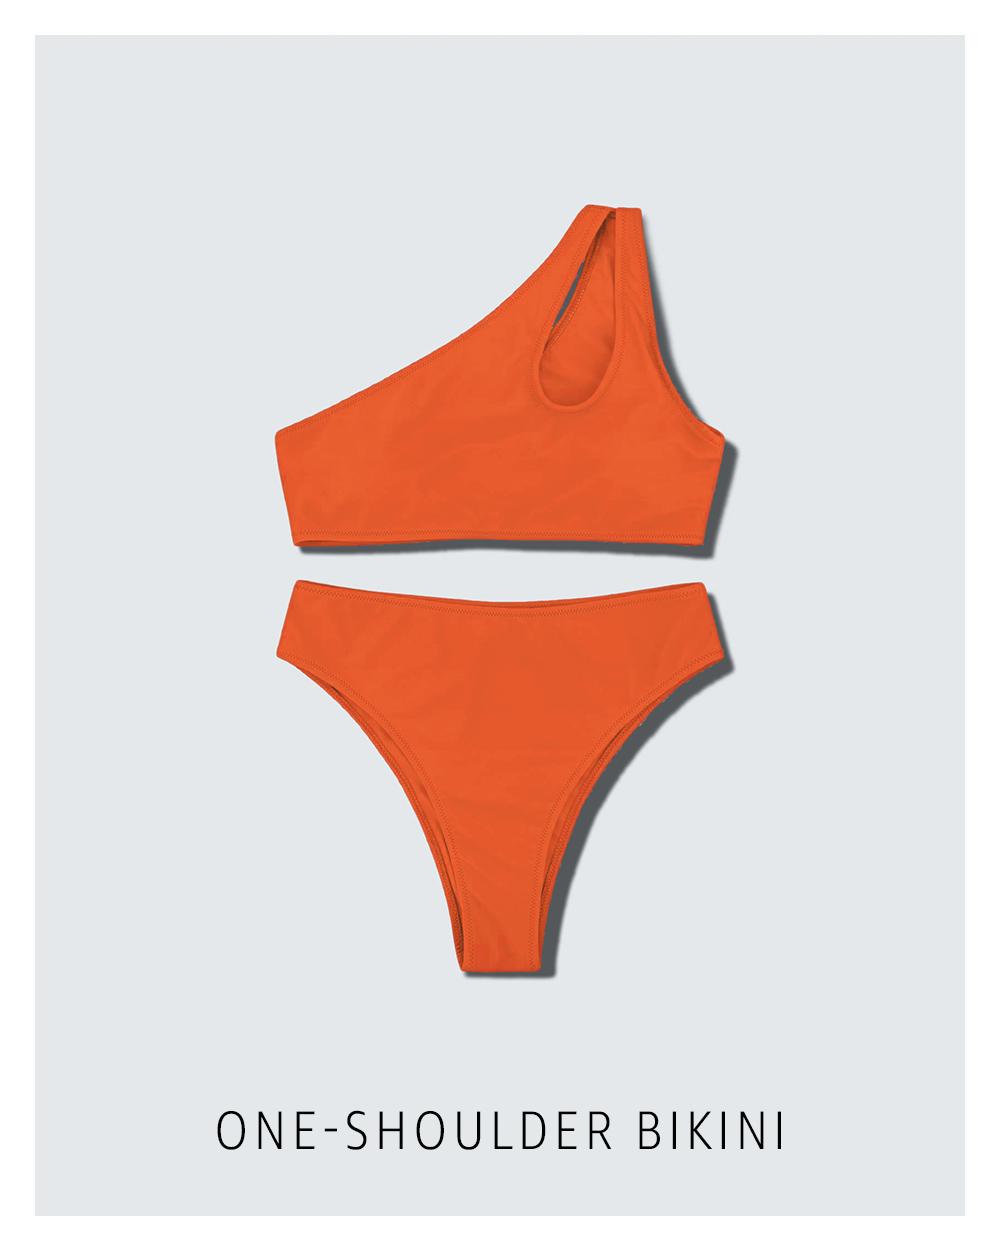 One-shoulder bikini